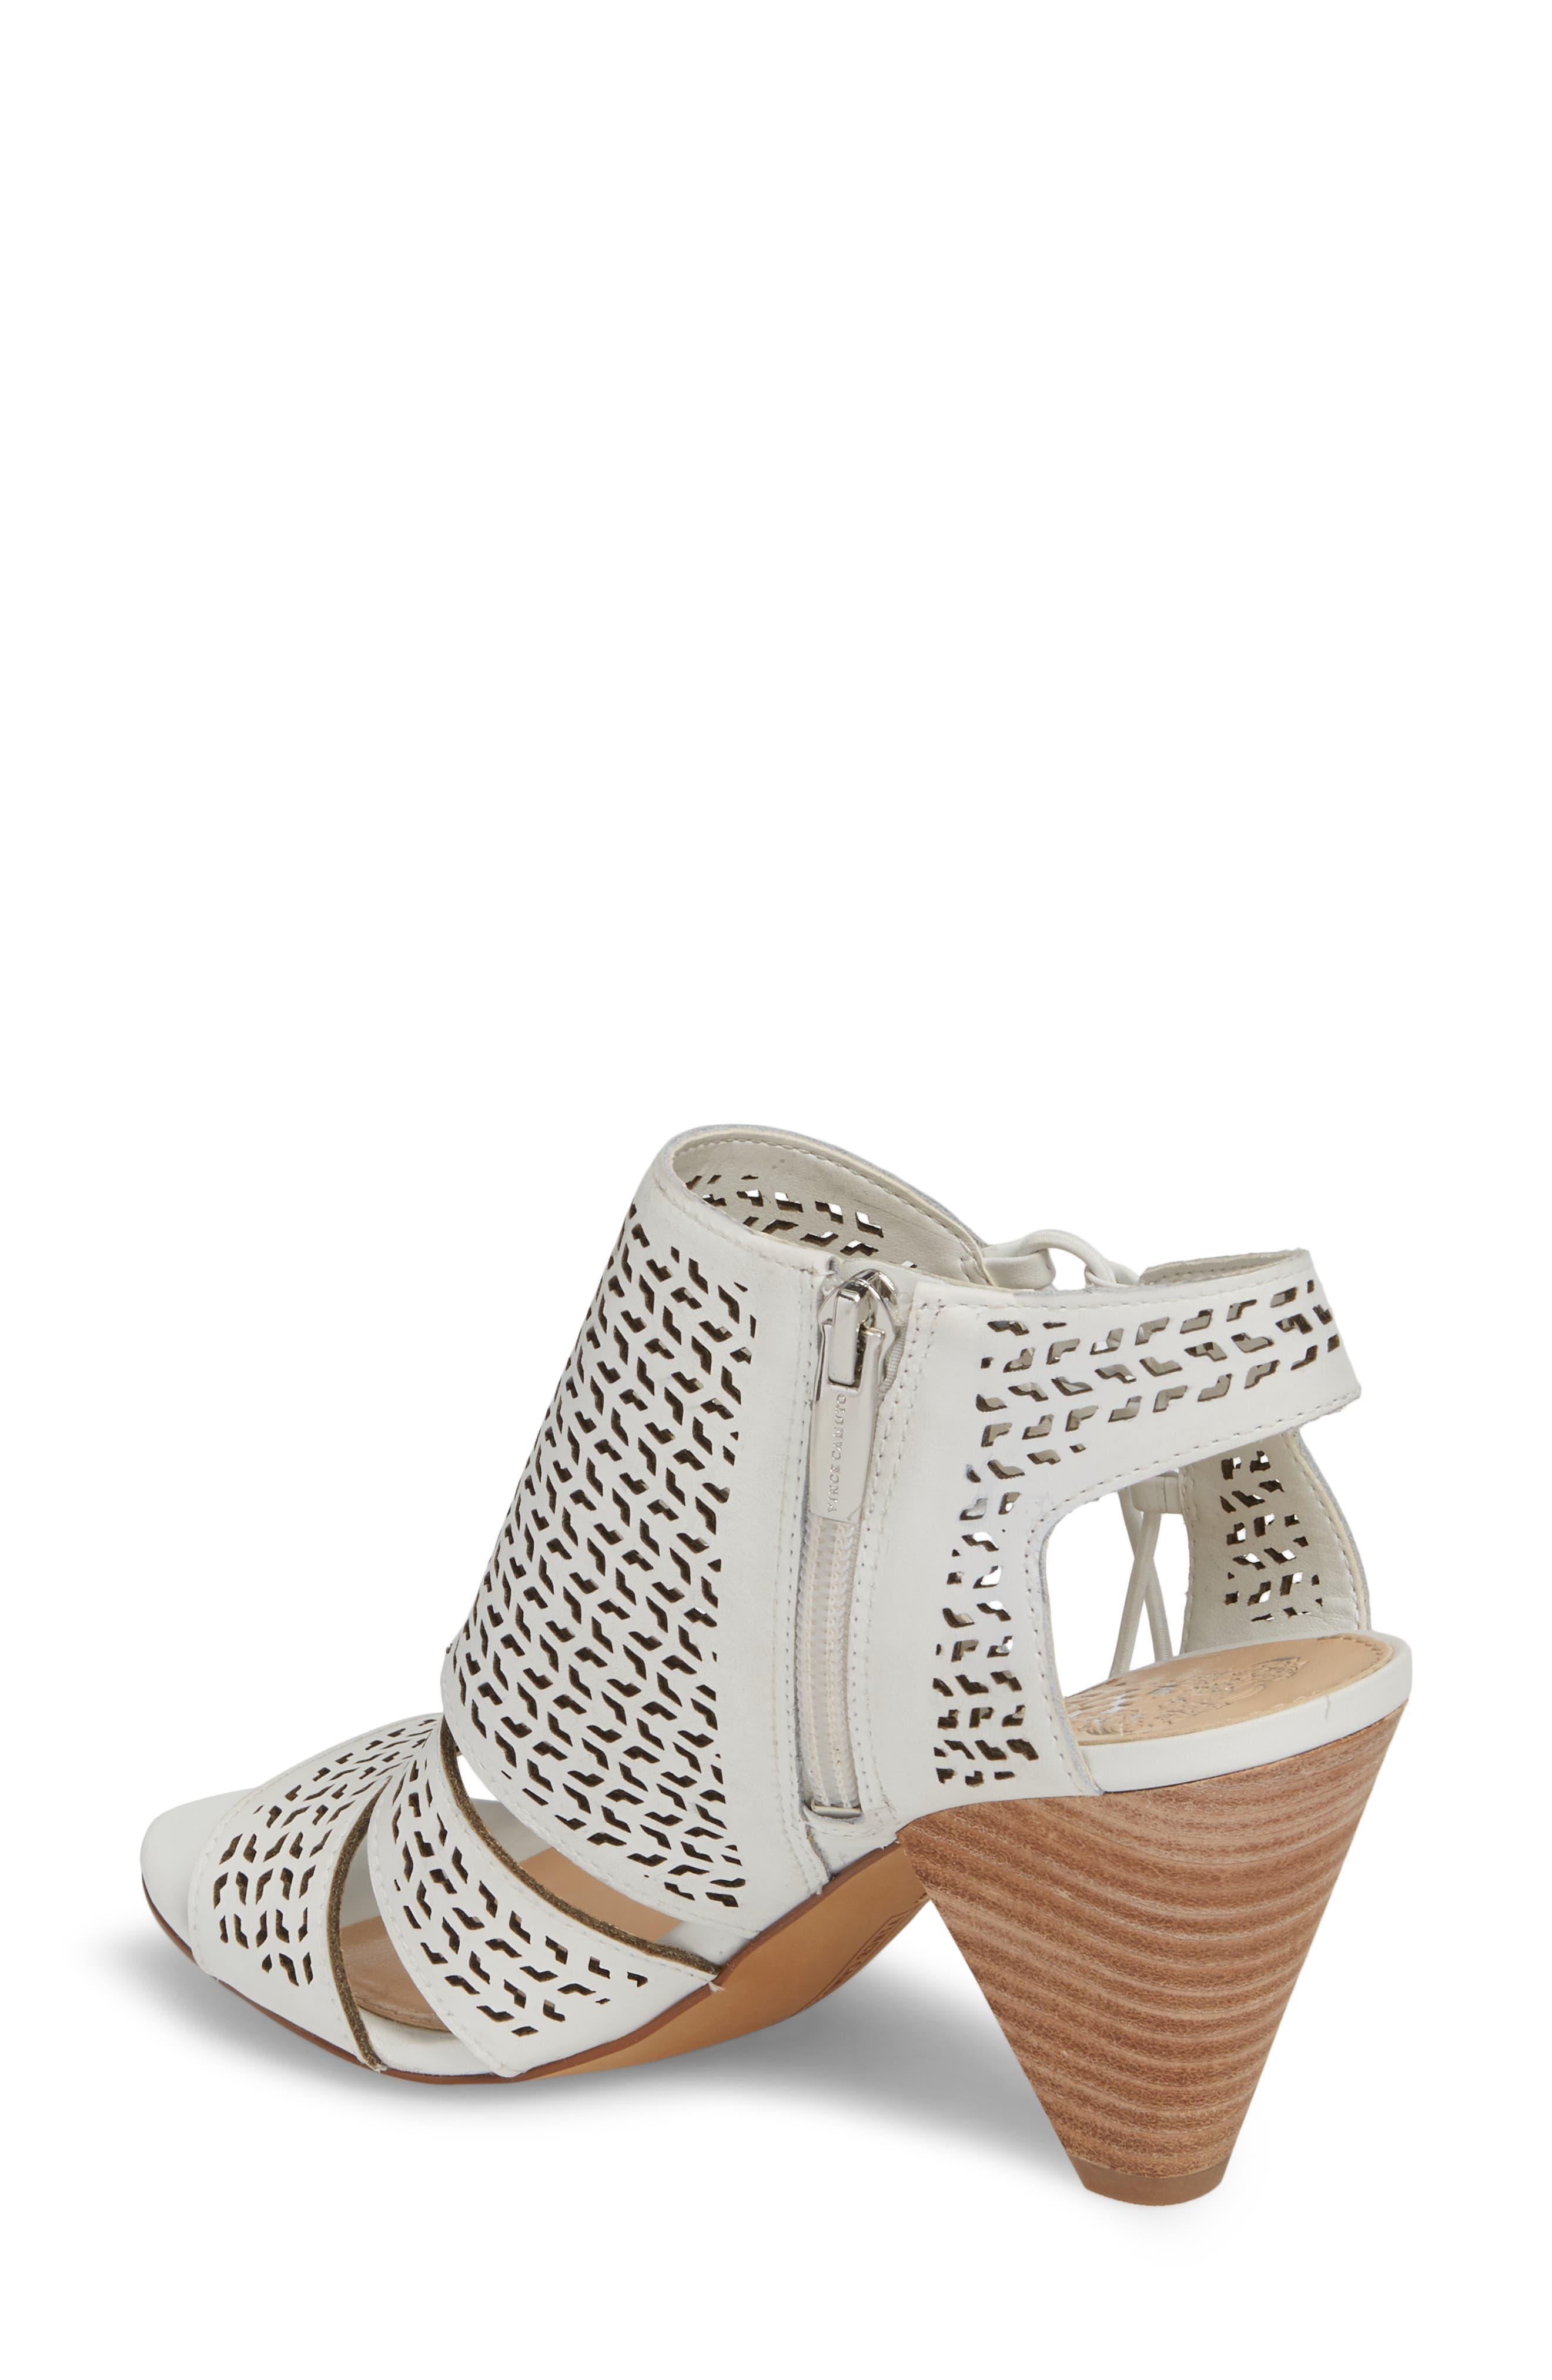 Esten Perforated Sandal,                             Alternate thumbnail 2, color,                             Pure Leather